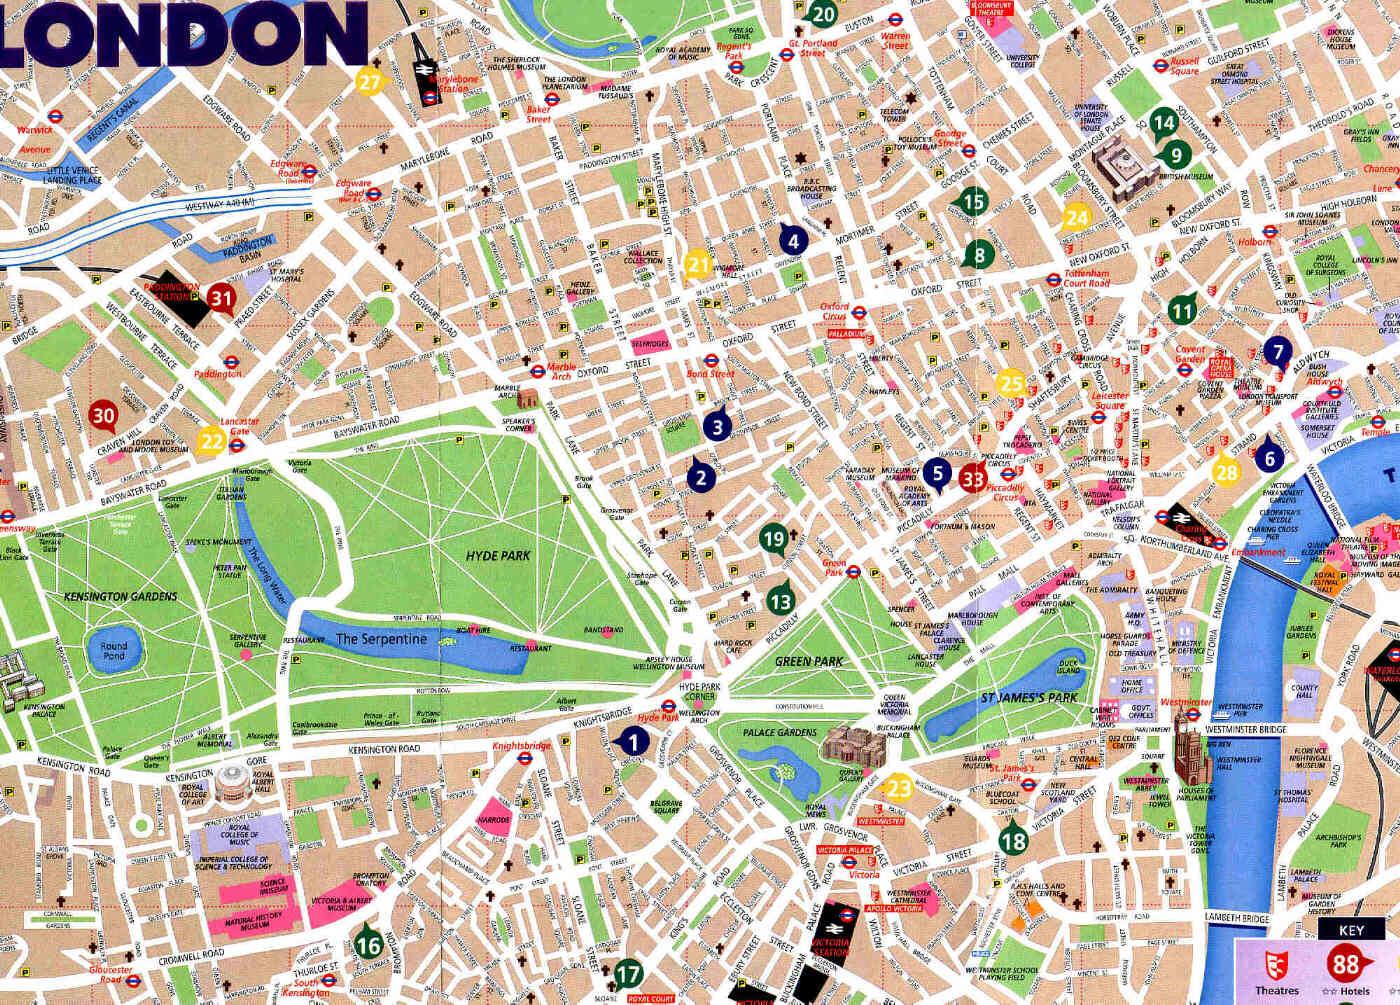 London Street Map Pdf Free Download.100 London Tourist Map Pdf Yasminroohi